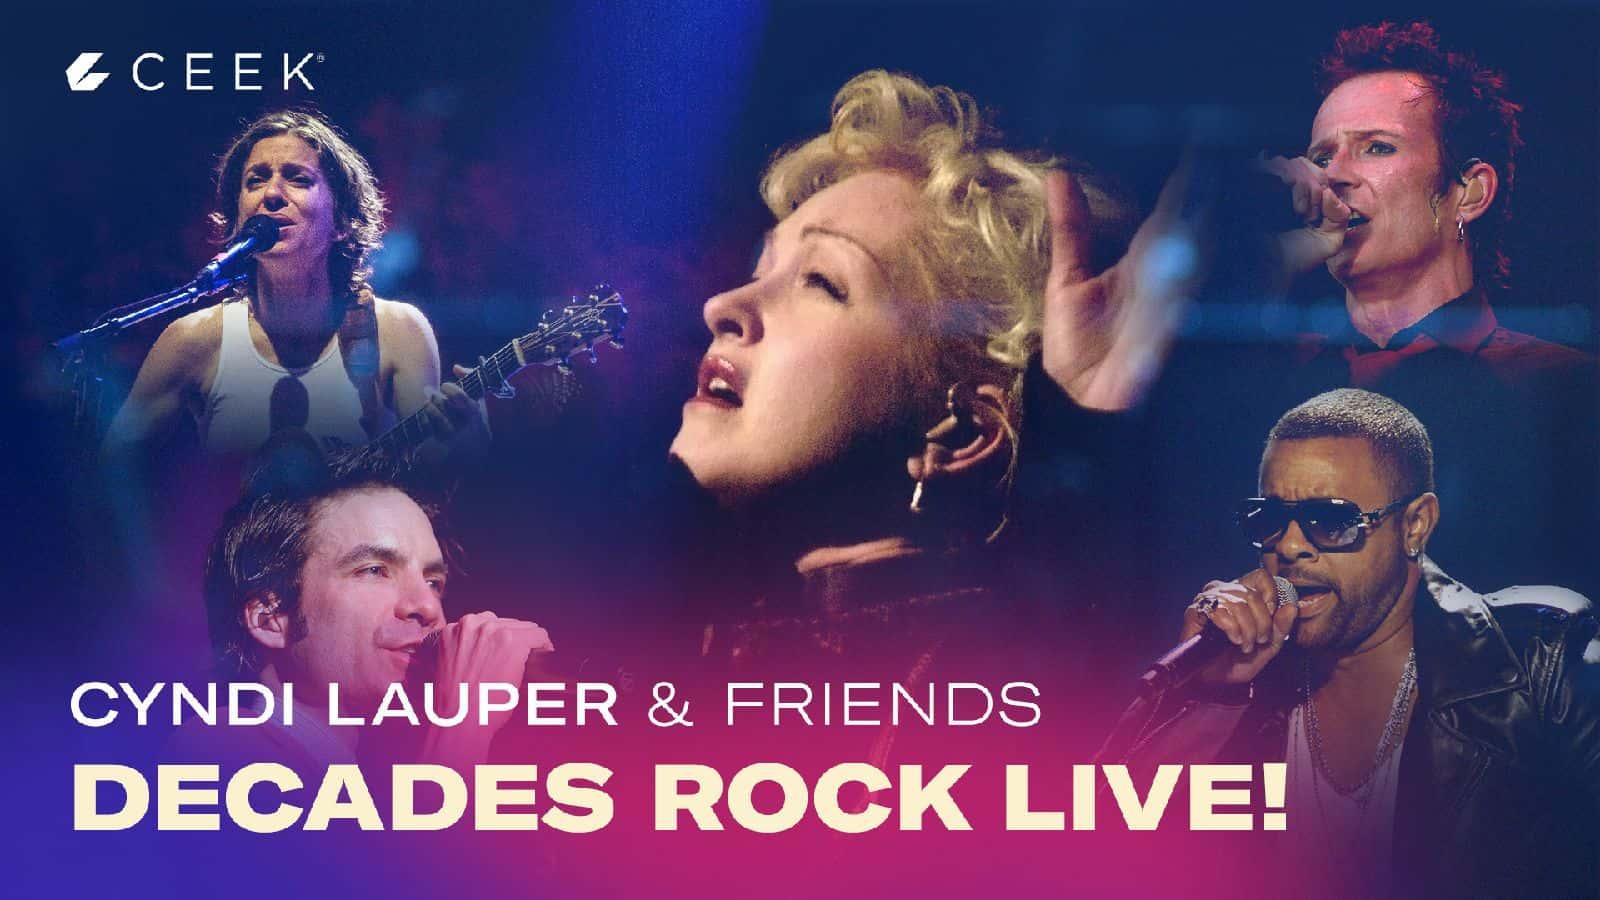 Decades Rock Cyndi Lauper ceek.com